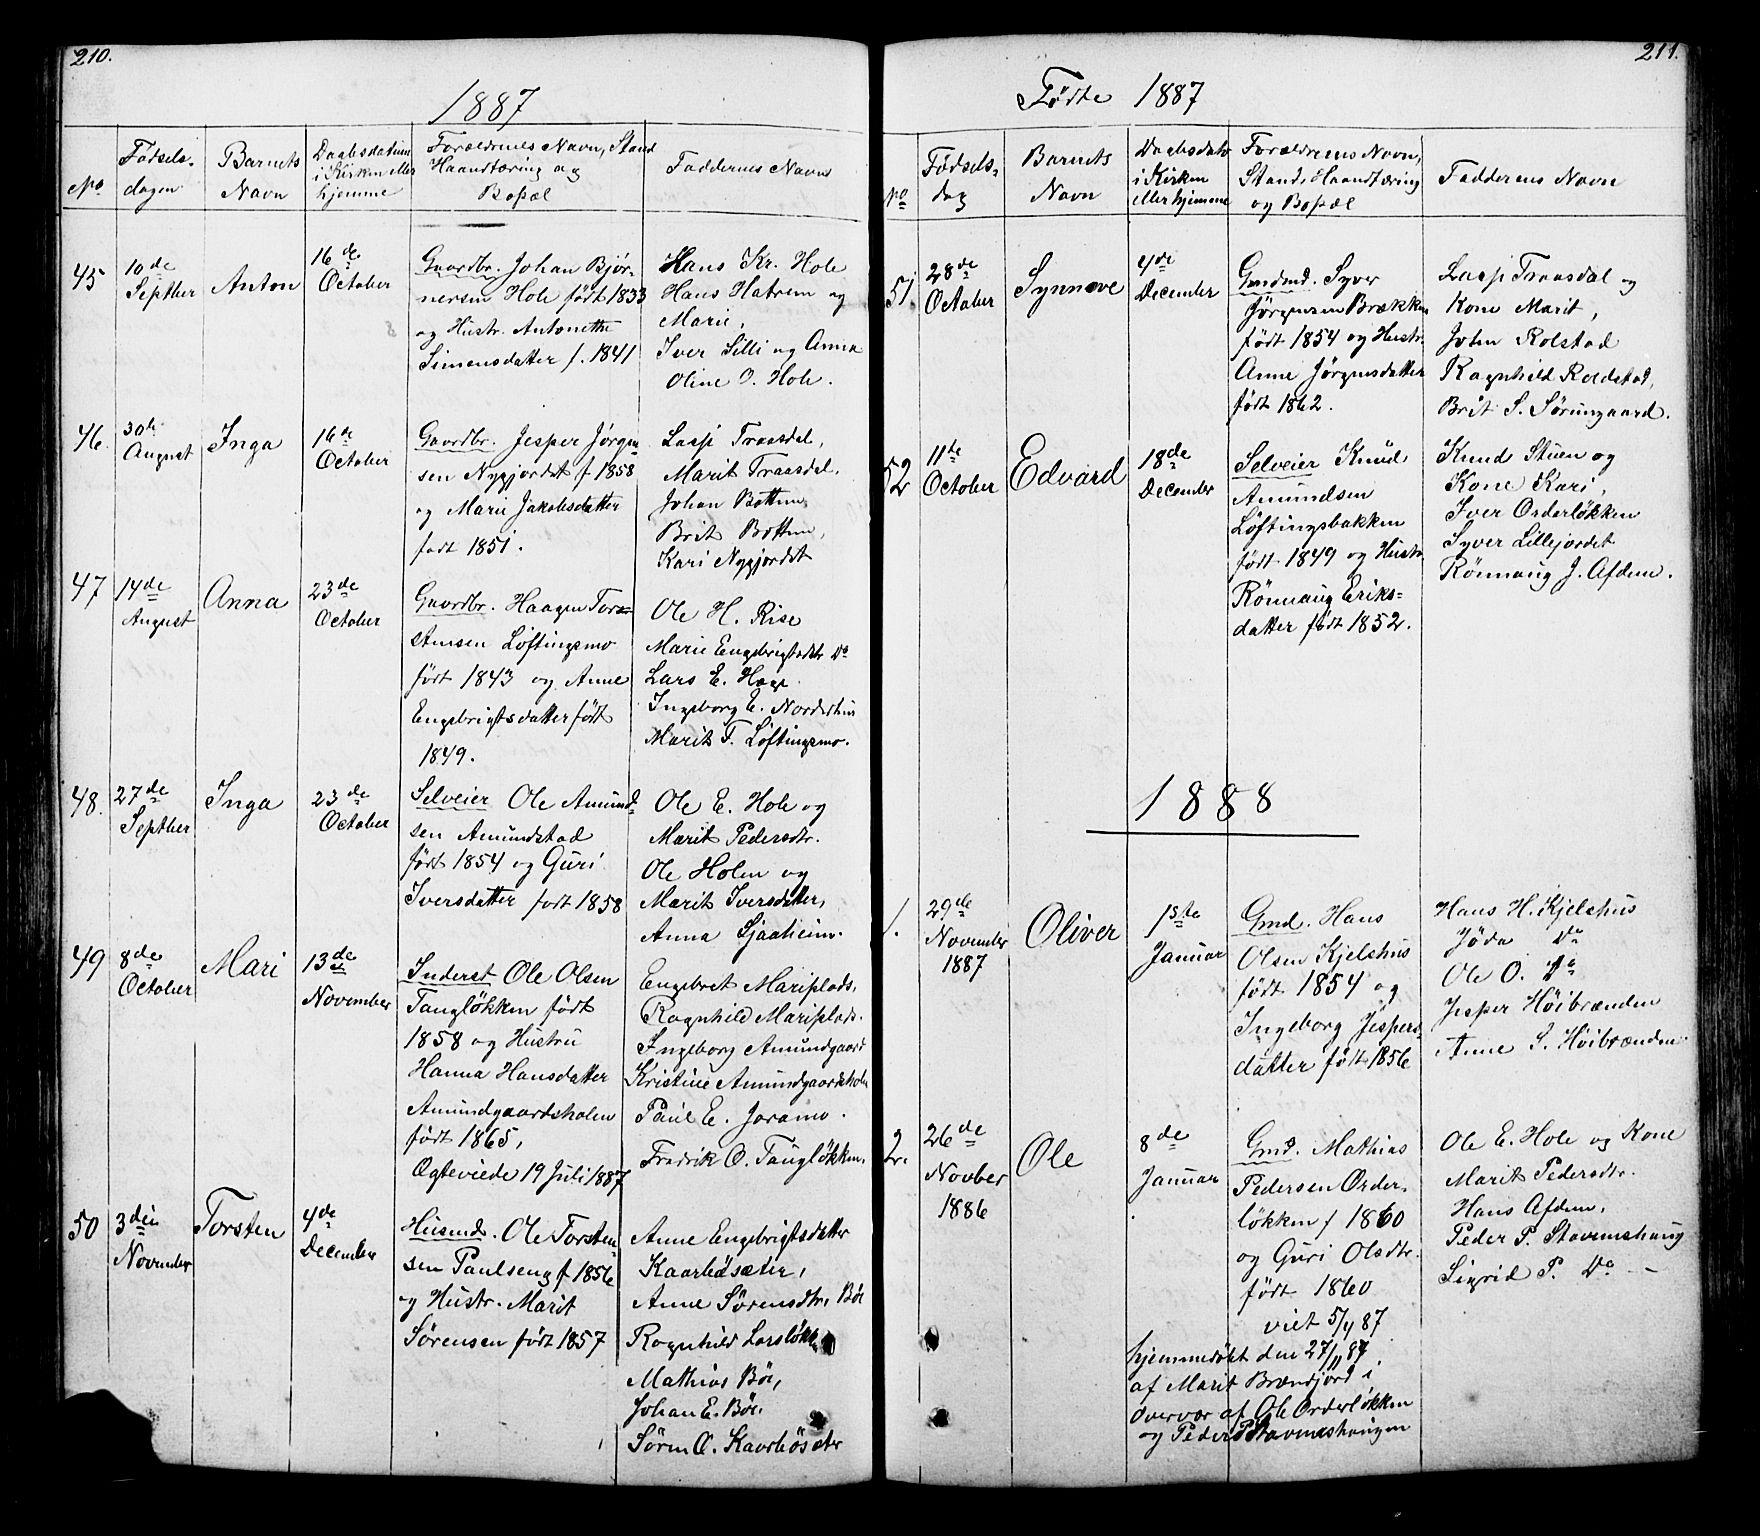 SAH, Lesja prestekontor, Klokkerbok nr. 5, 1850-1894, s. 210-211